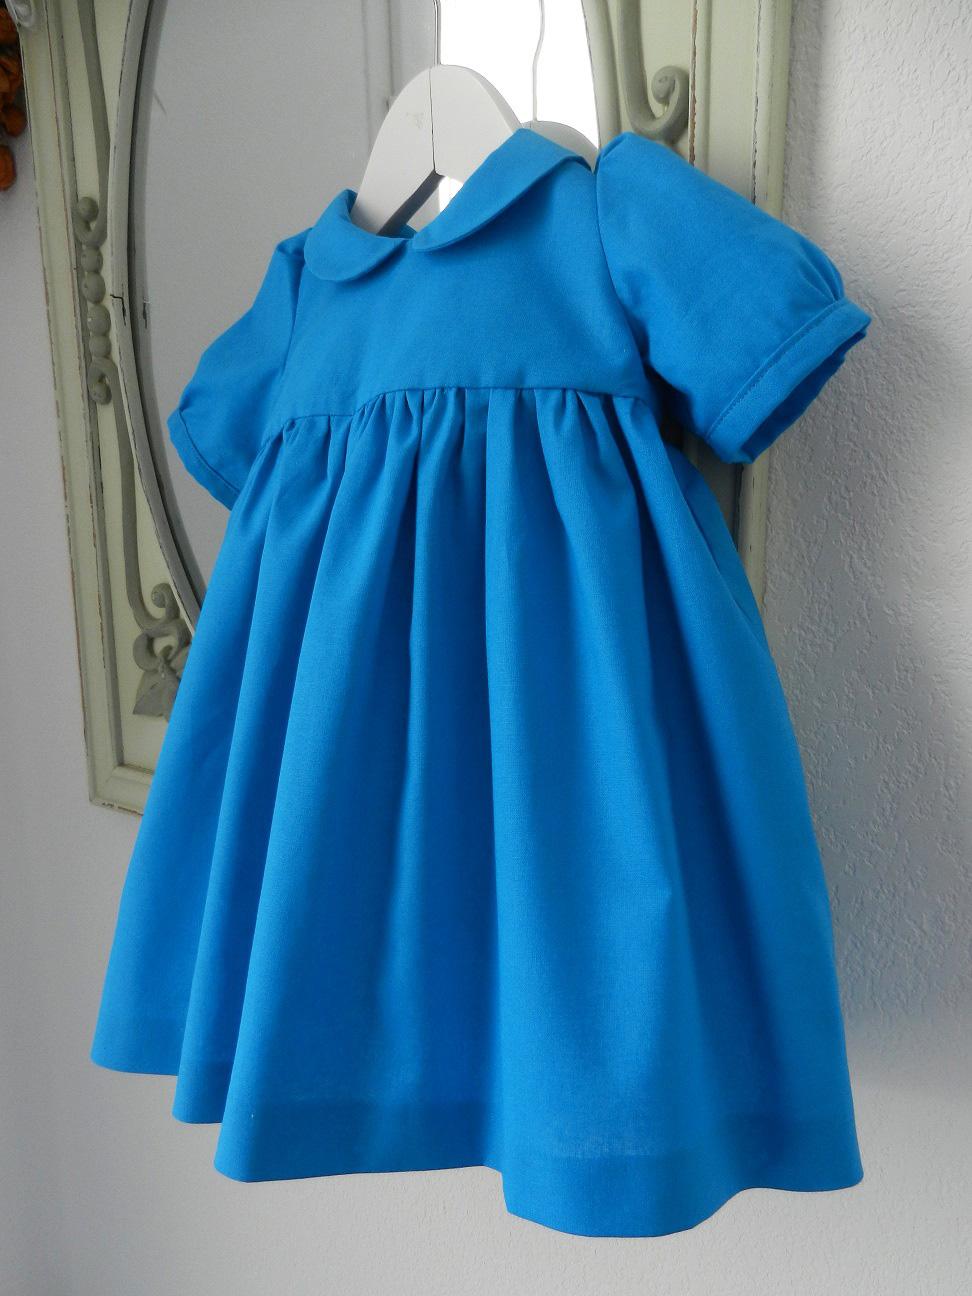 Duchesse or ange 190 robe bleue alice tablier blanc jupon blue dress white apron petticoat b